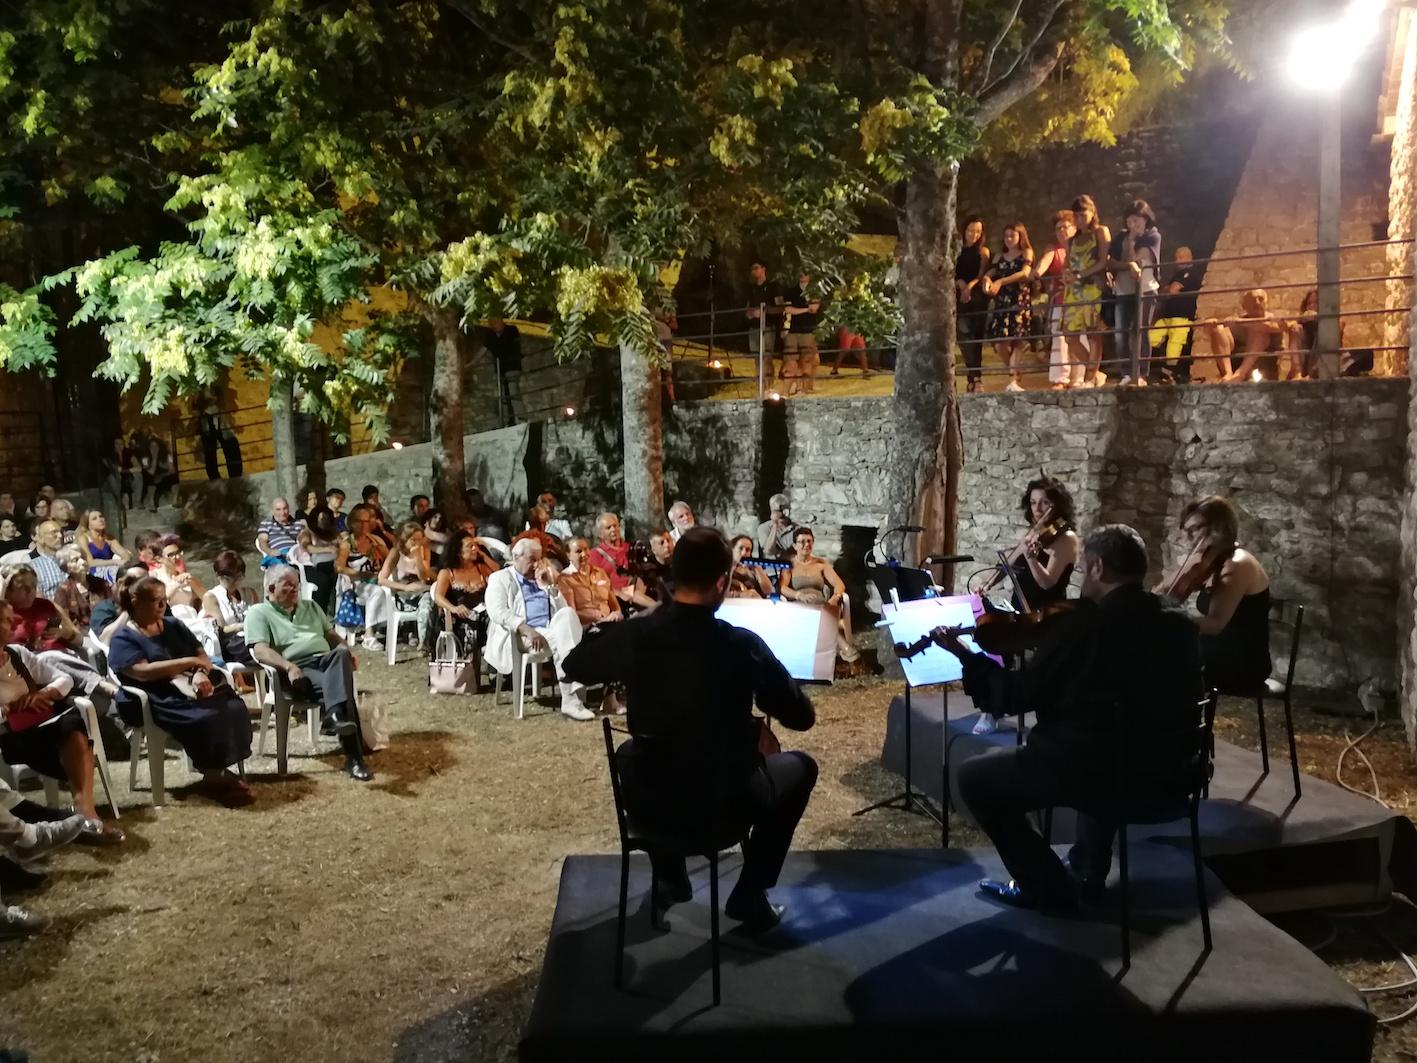 Musica Intorno, Orchestra Regionale a Caldarola e Serrapetrona